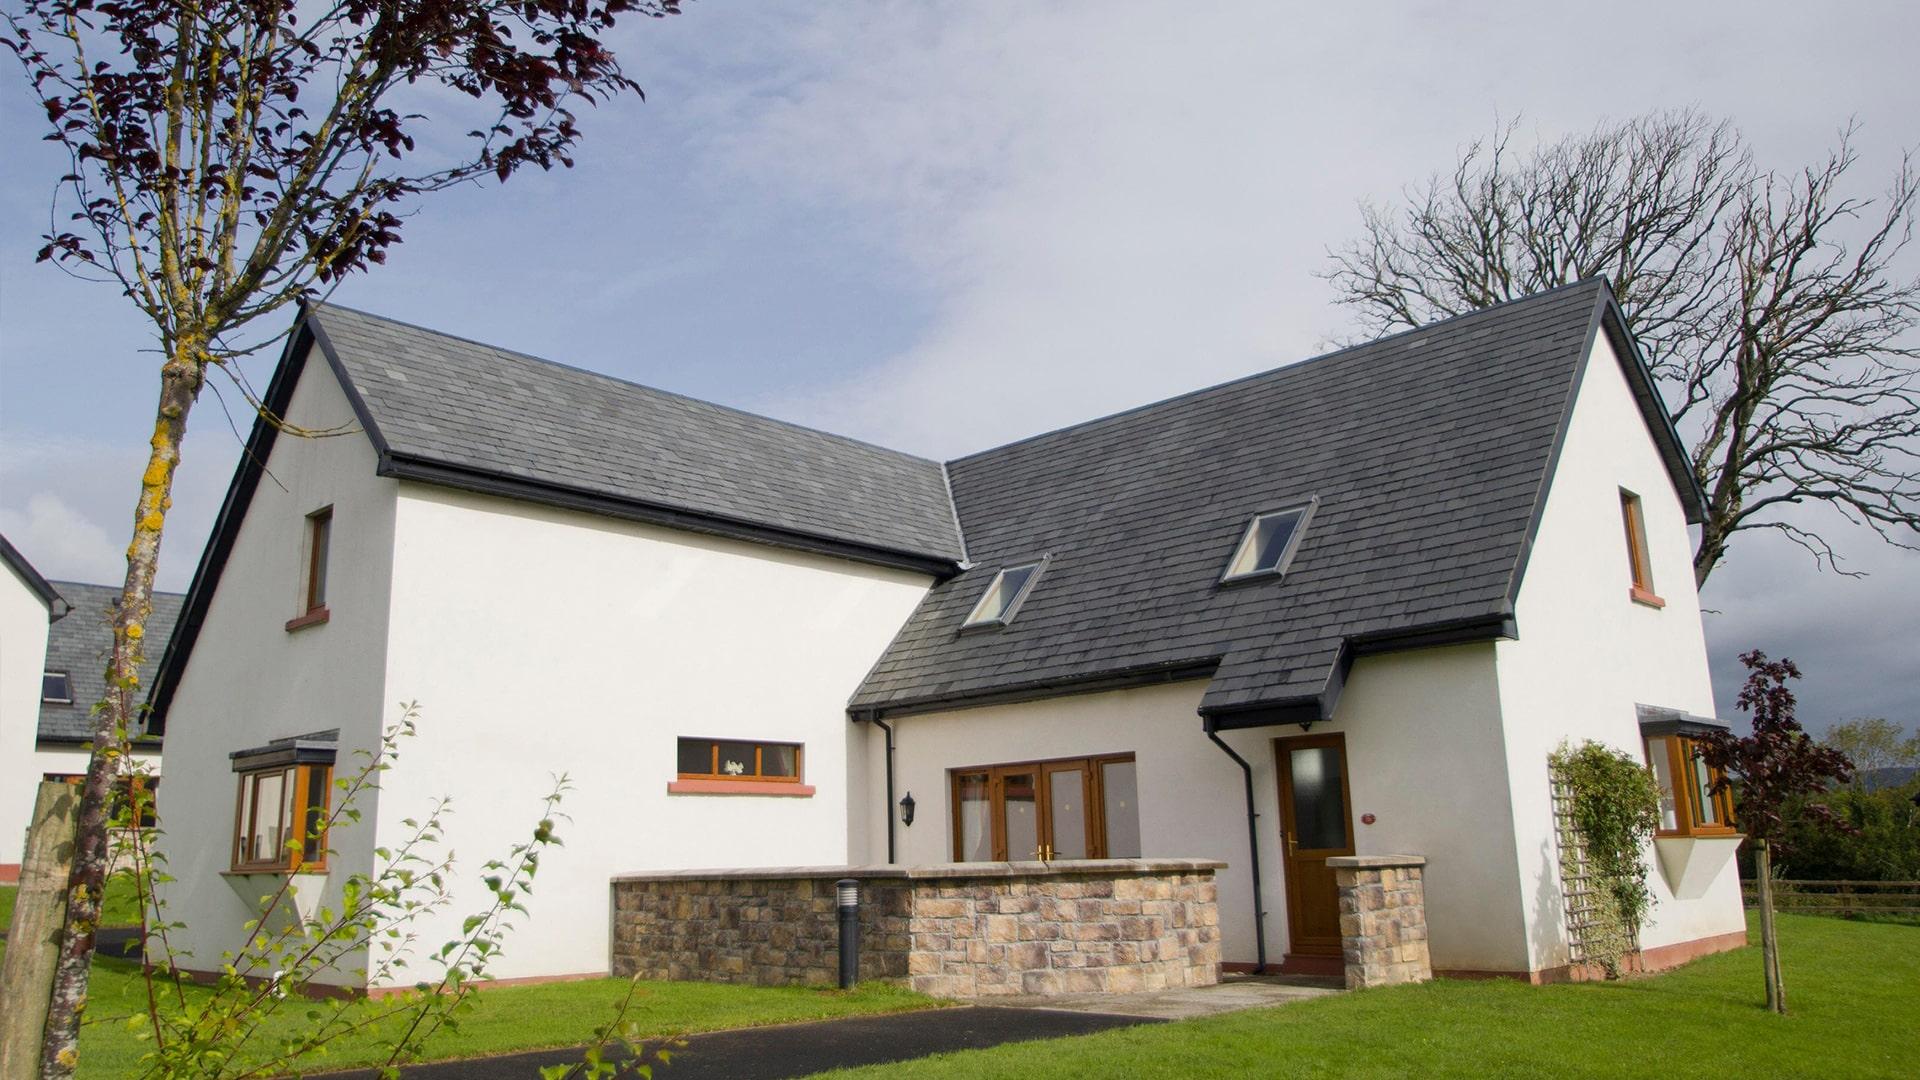 East_Clare_Golf_Village-exterior-(4)-min